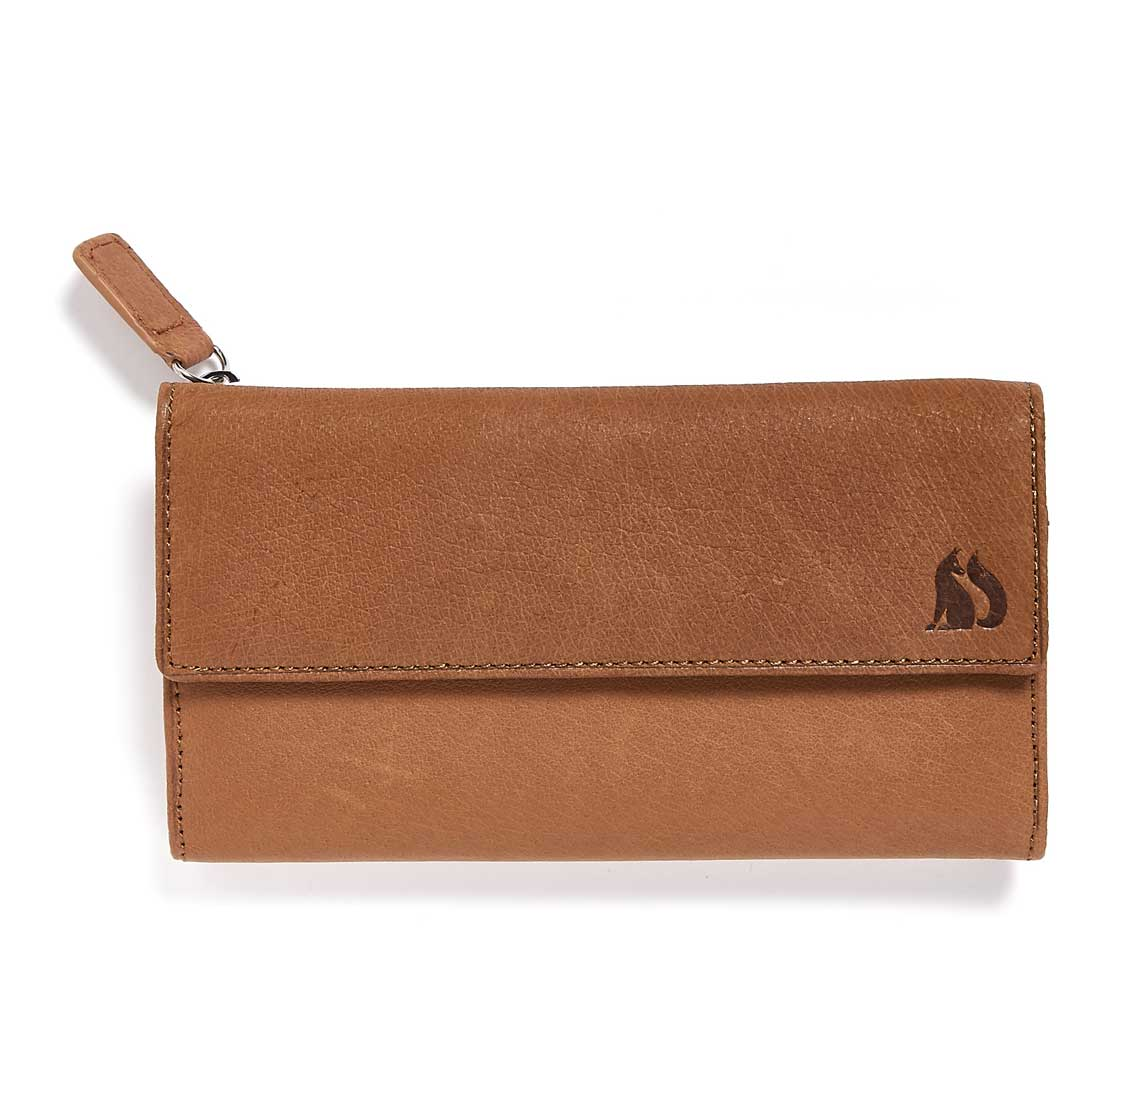 Foxfield Tan Leather Purse Windermere